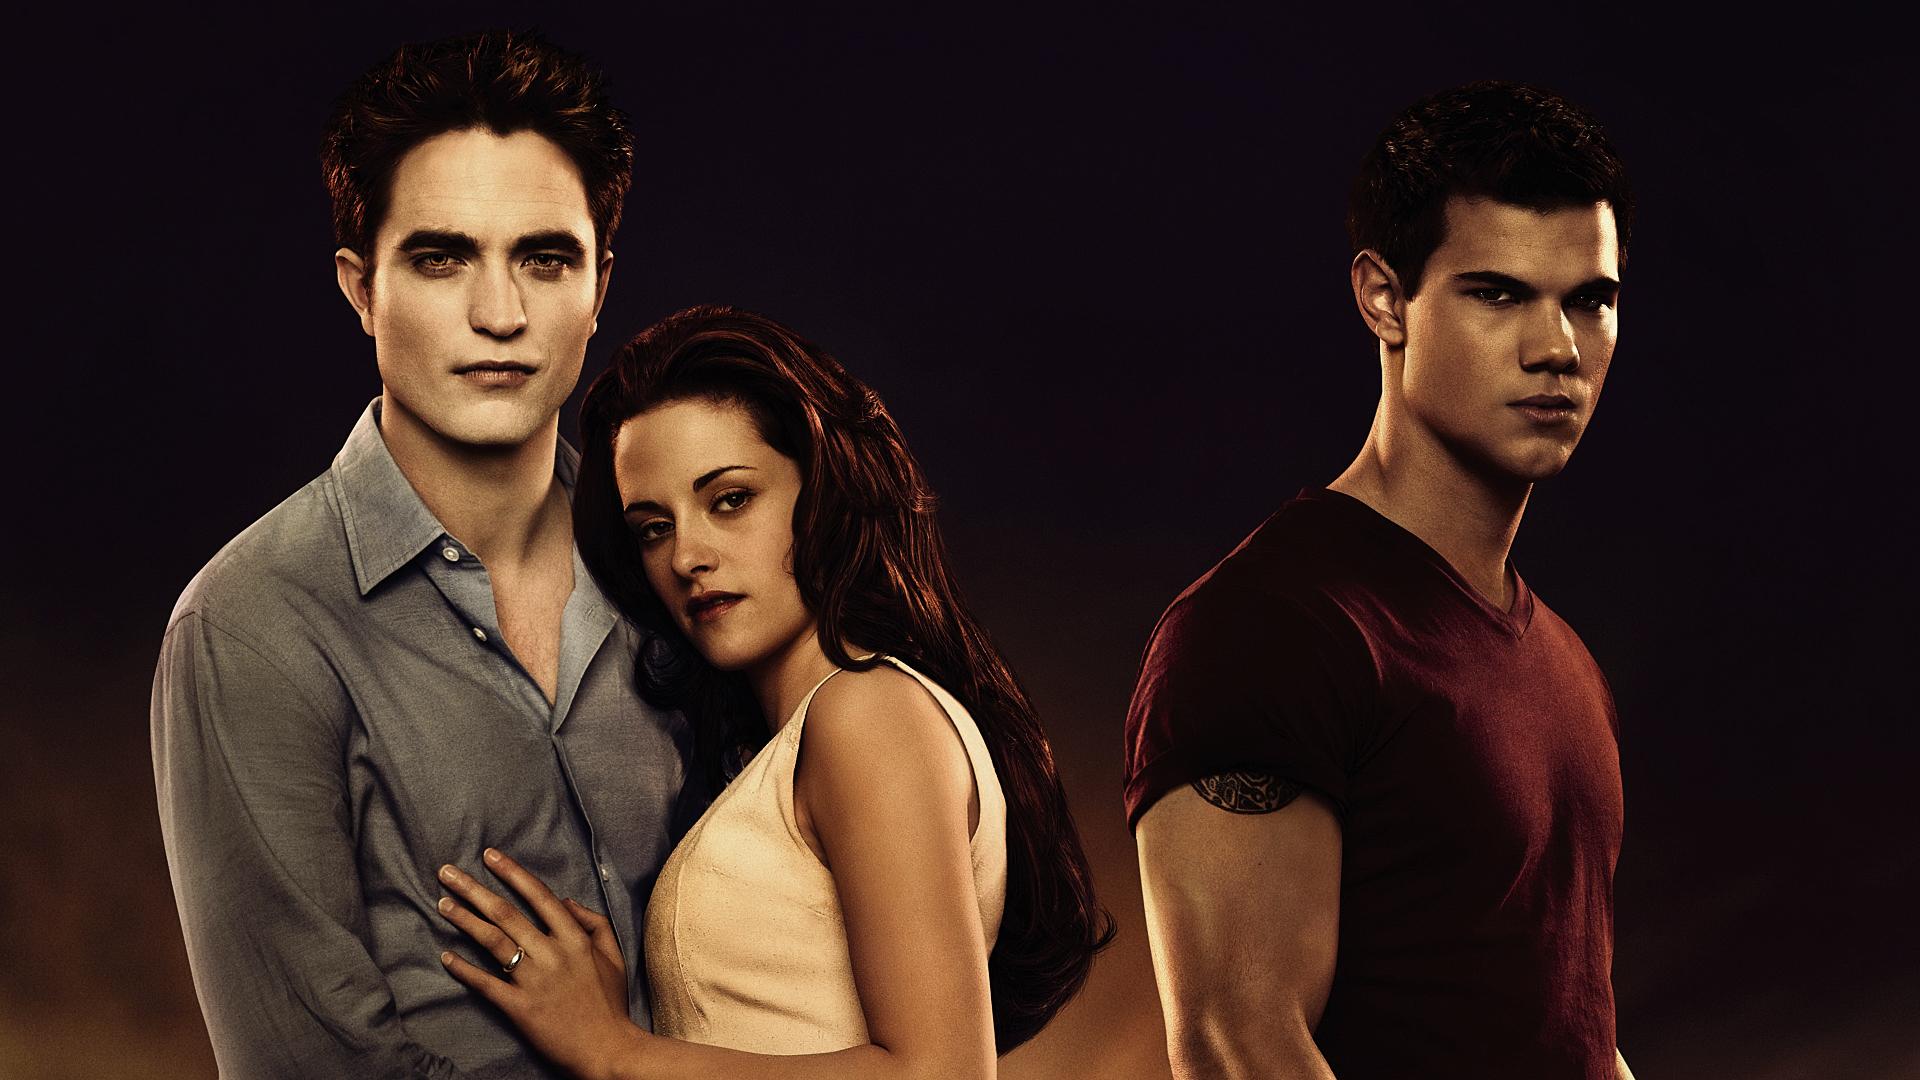 The Twilight Saga: Breaking Dawn - Part 2 (2012) Movie Photos and Twilight saga breaking dawn part 2 photos